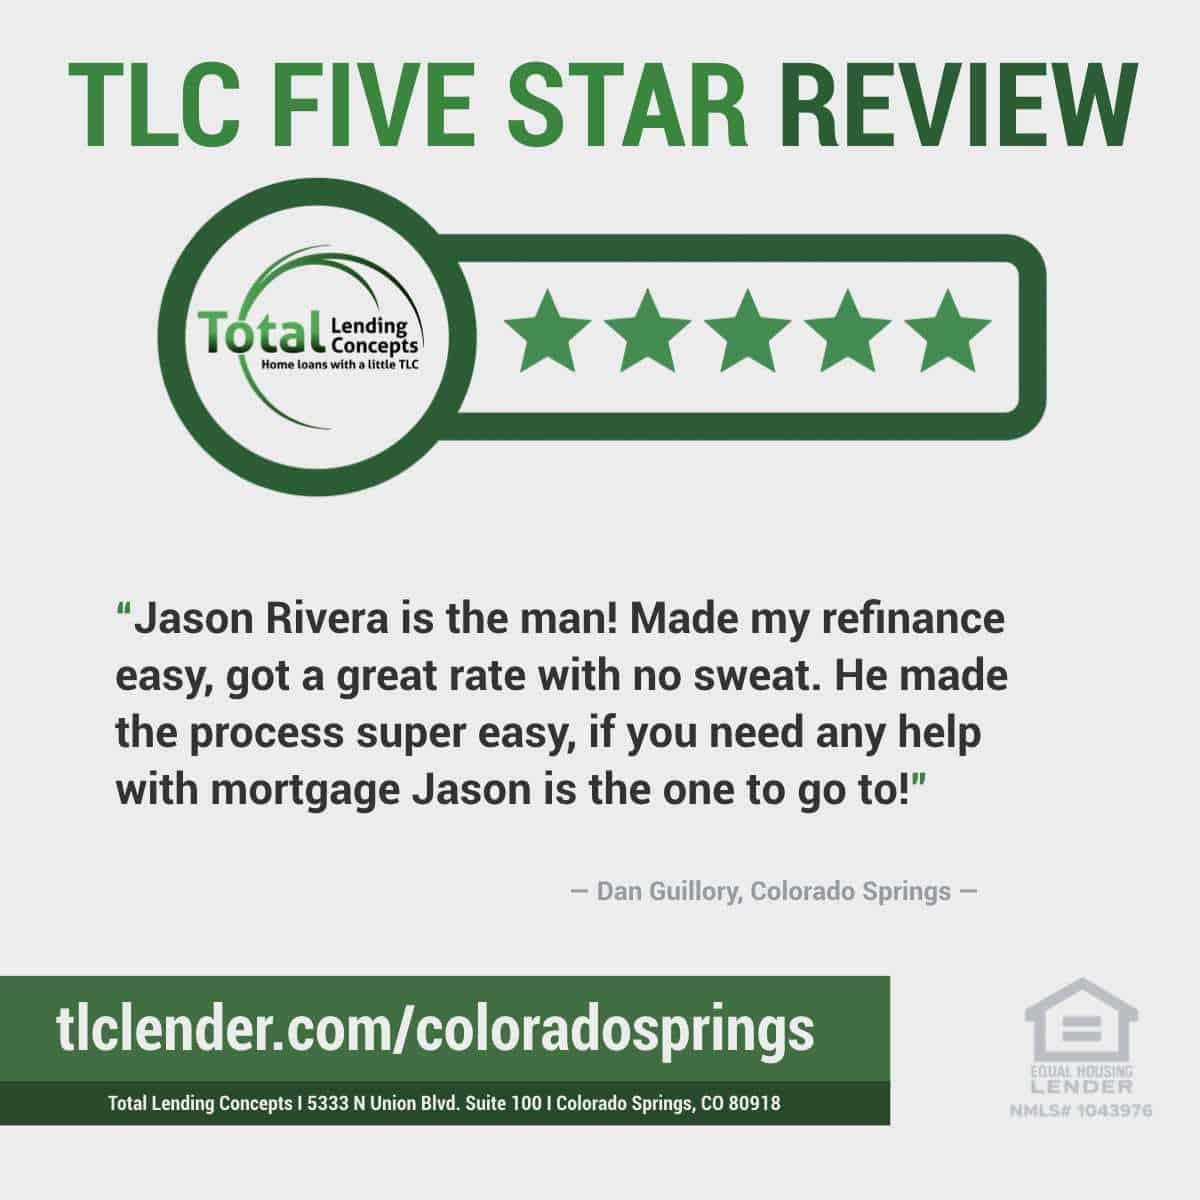 Total-Lending-Concepts-Five-Star-Review-Dan-Guillory-in-Colorado-Springs-Colorado-for-Jason-Rivera-House-Loan